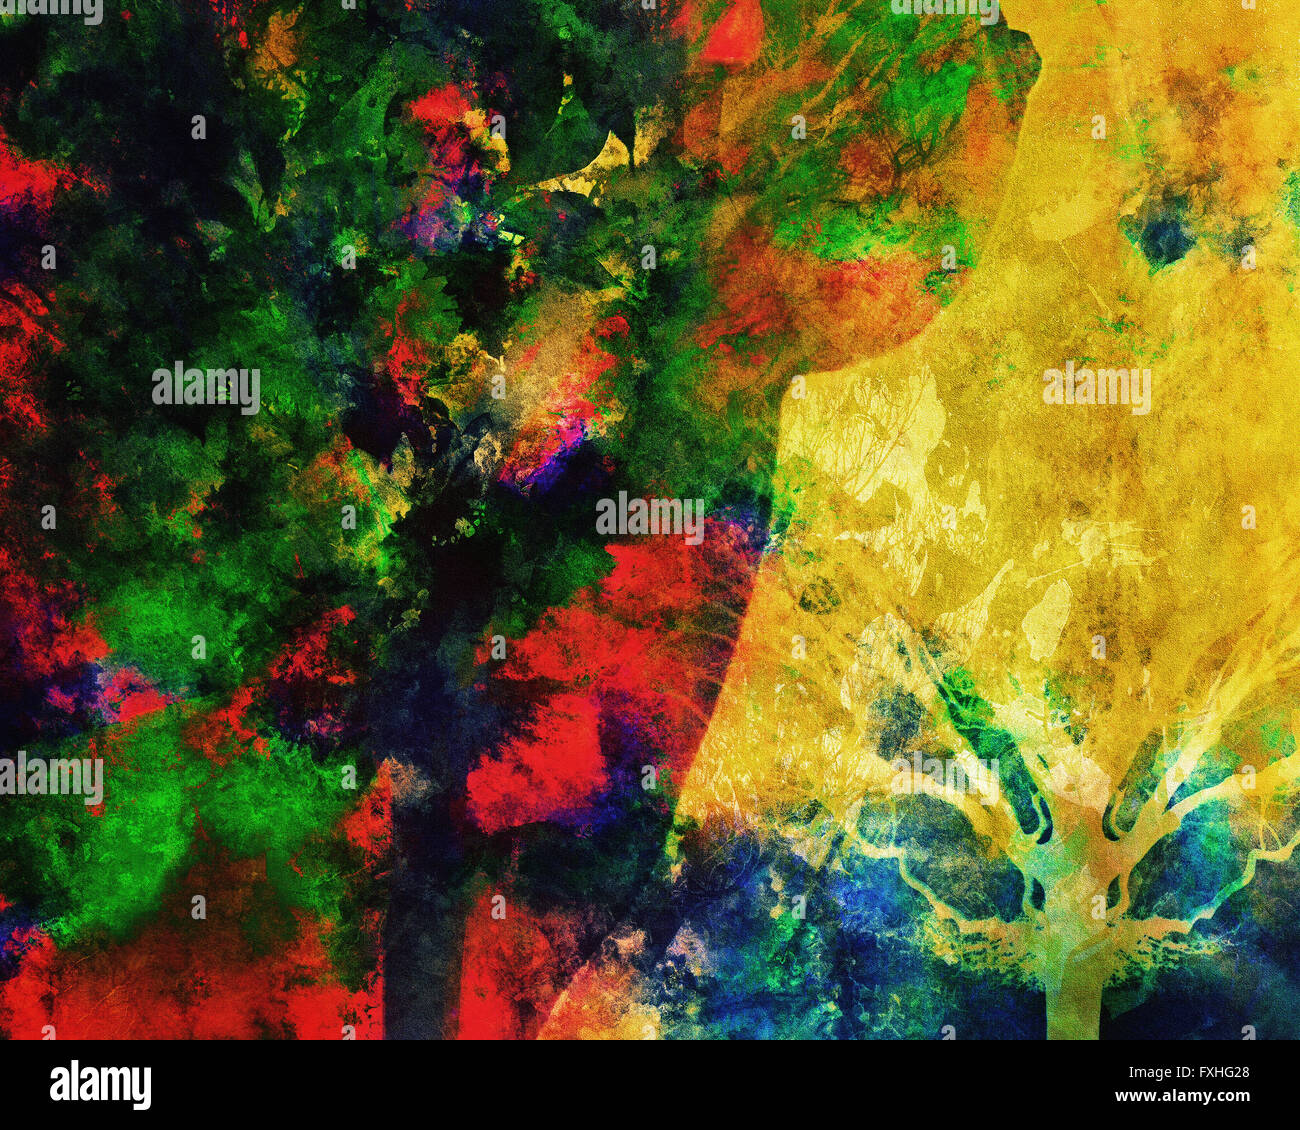 DIGITAL ART: The Autumn Hour Stock Photo